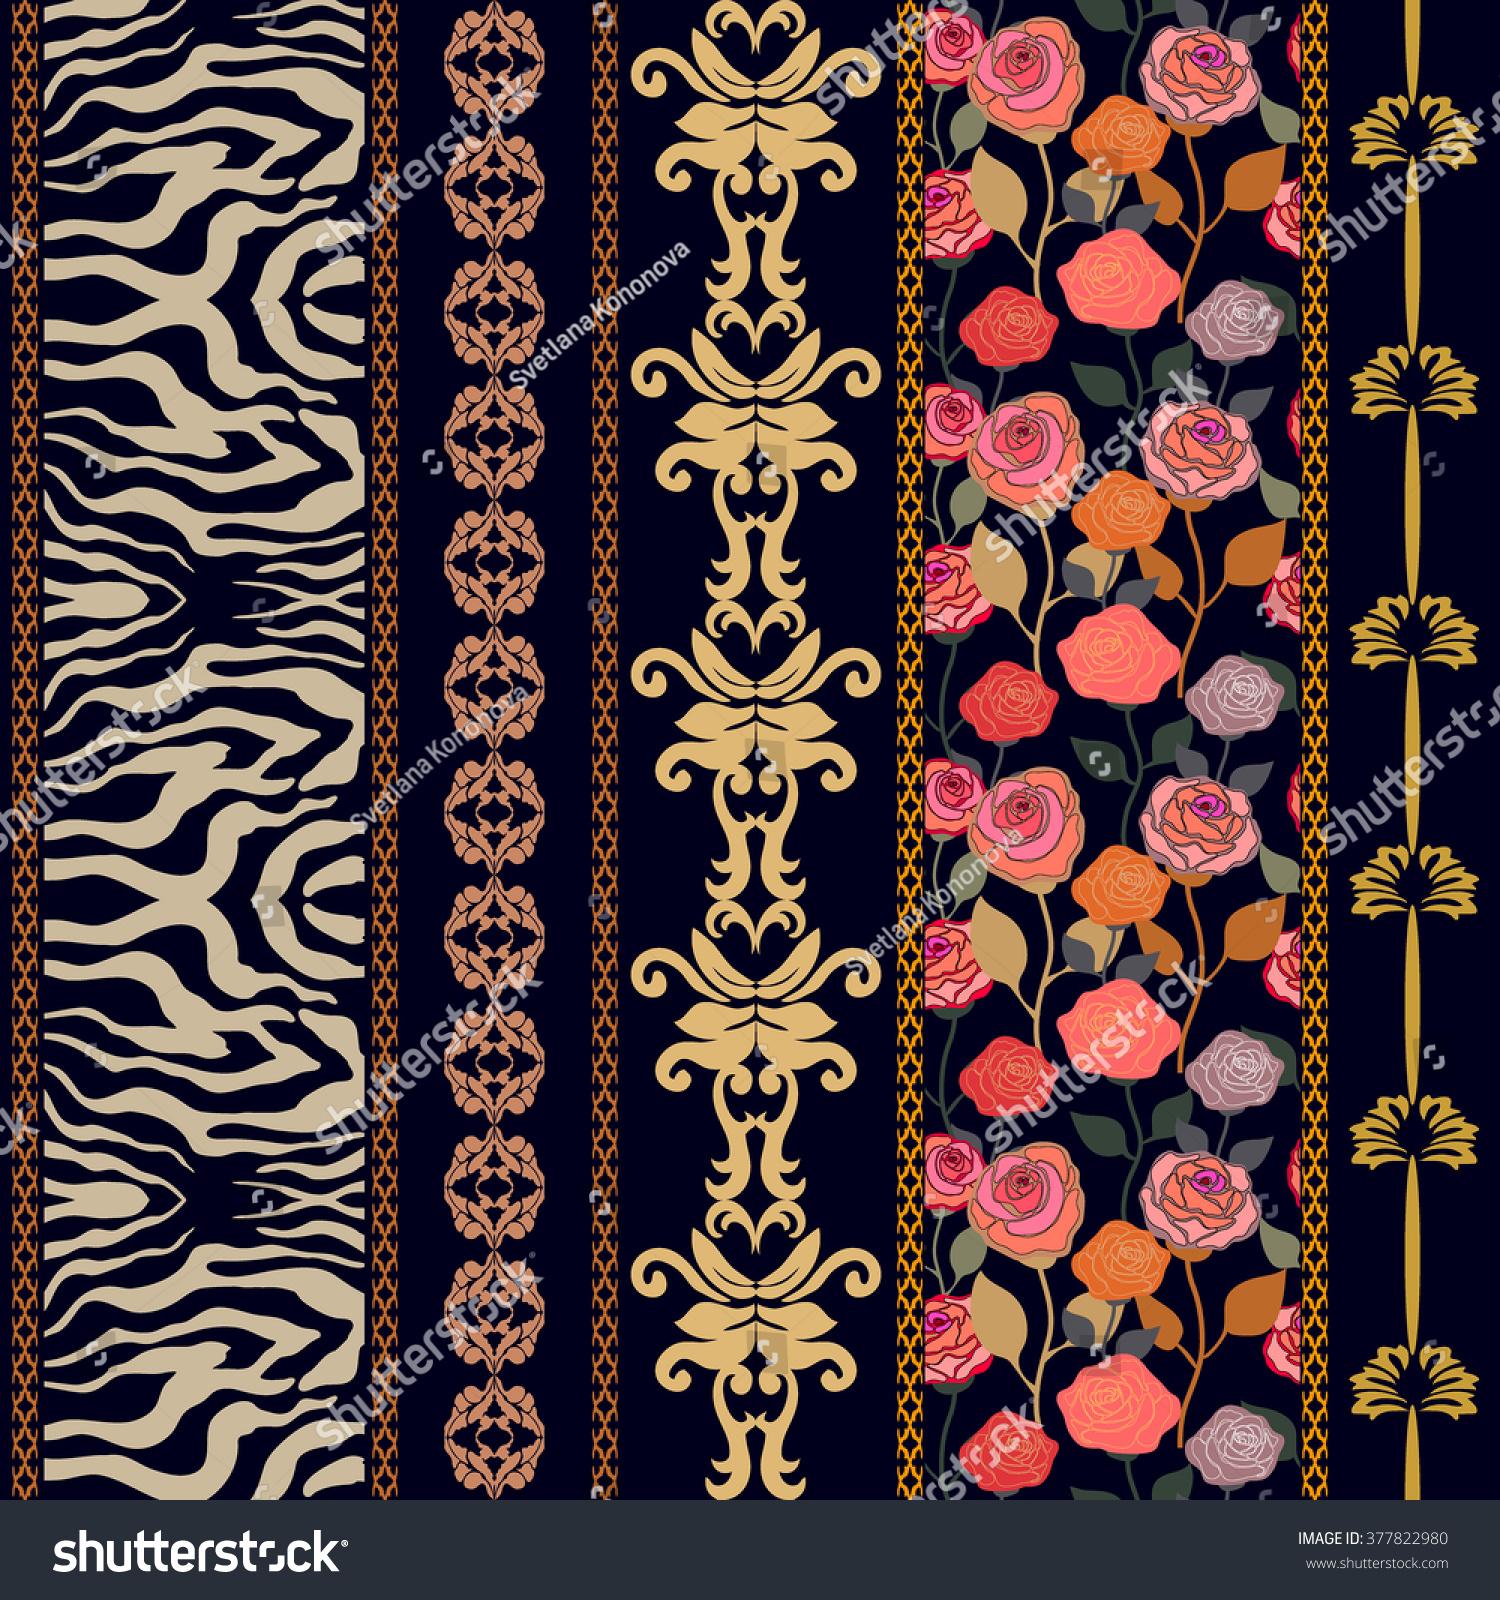 art deco vintage silk wallpaper ethnic stock vector 377822980 shutterstock. Black Bedroom Furniture Sets. Home Design Ideas